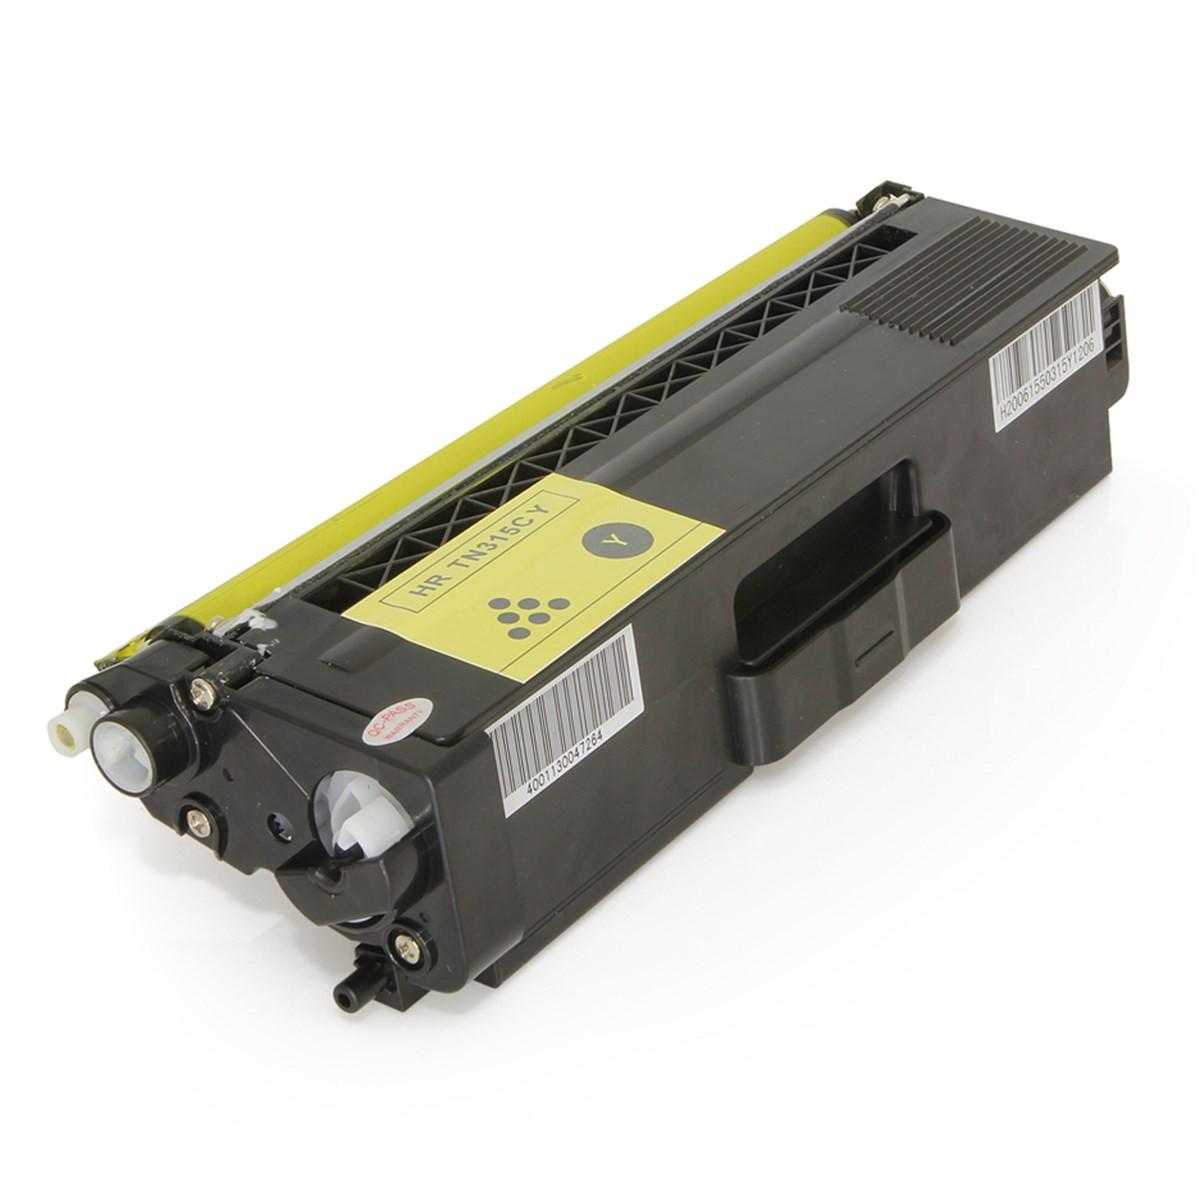 Toner Compatível com Brother TN310 TN310Y Amarelo | MFC9460CDN HL4150CDN HL4570CDW | Premium 1.5k